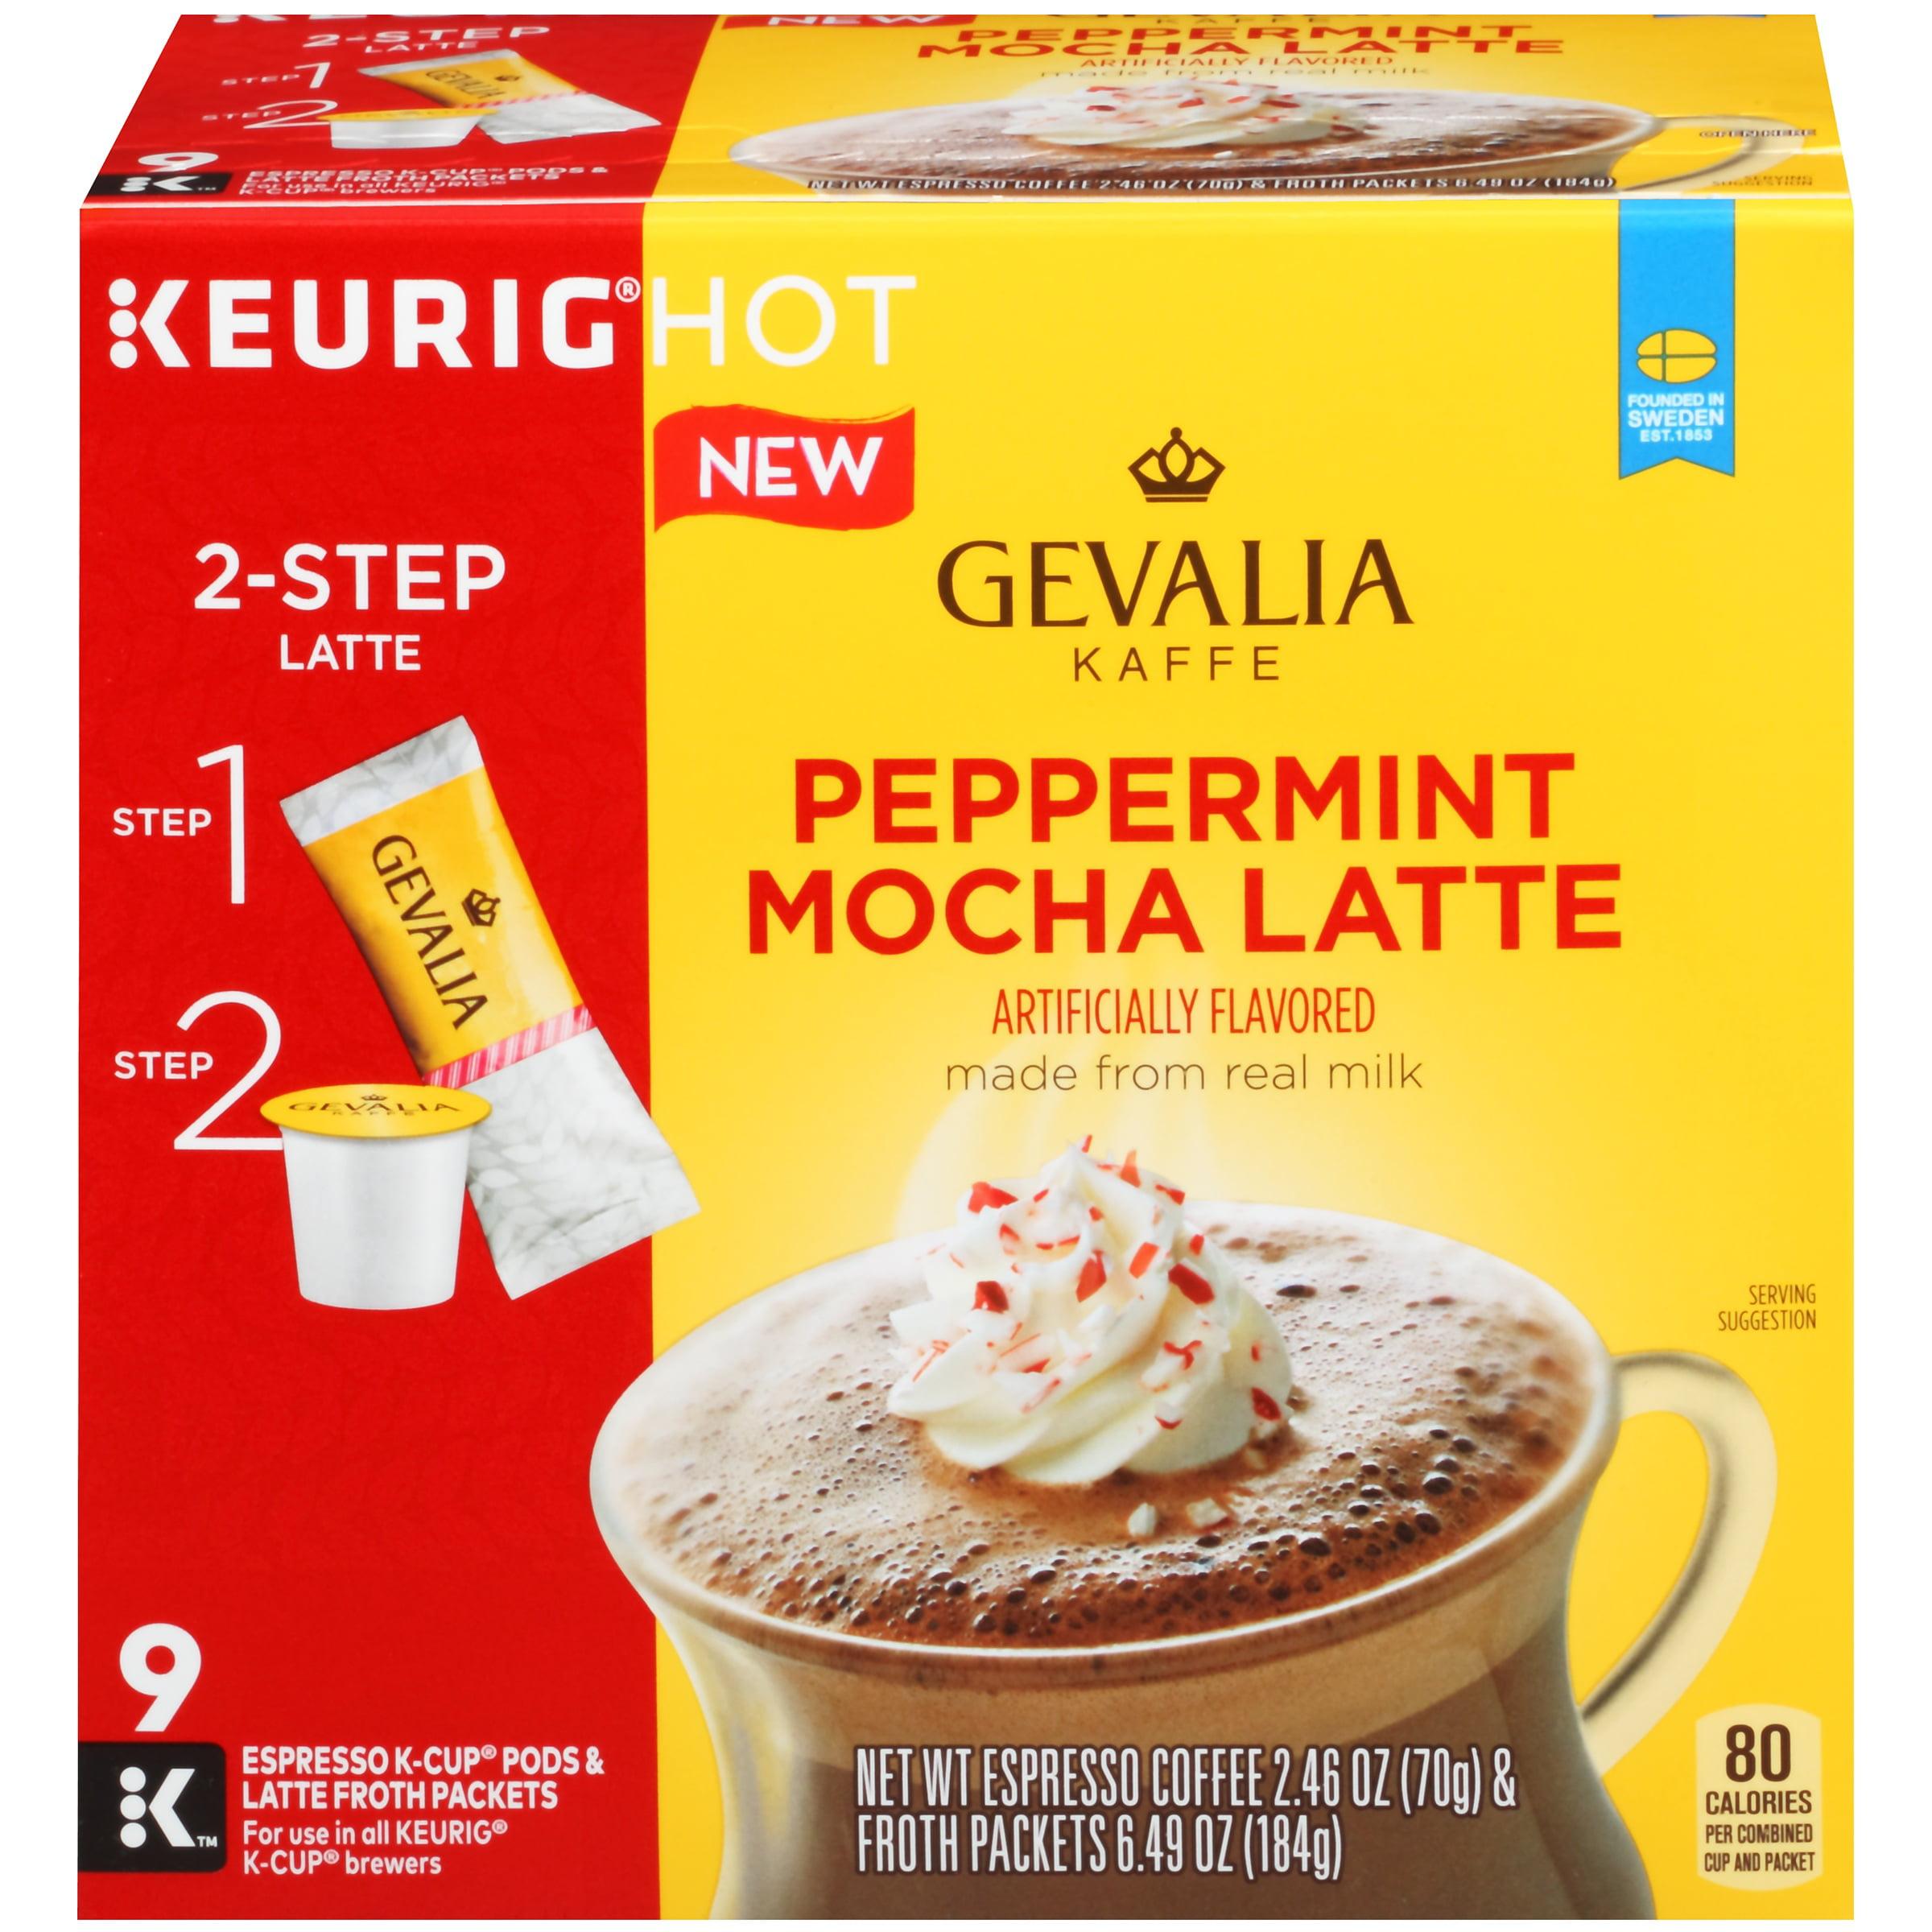 Gevalia Peppermint Mocha Latte Espresso K-Cup Pods & Latte Froth Packets 9 ct Box